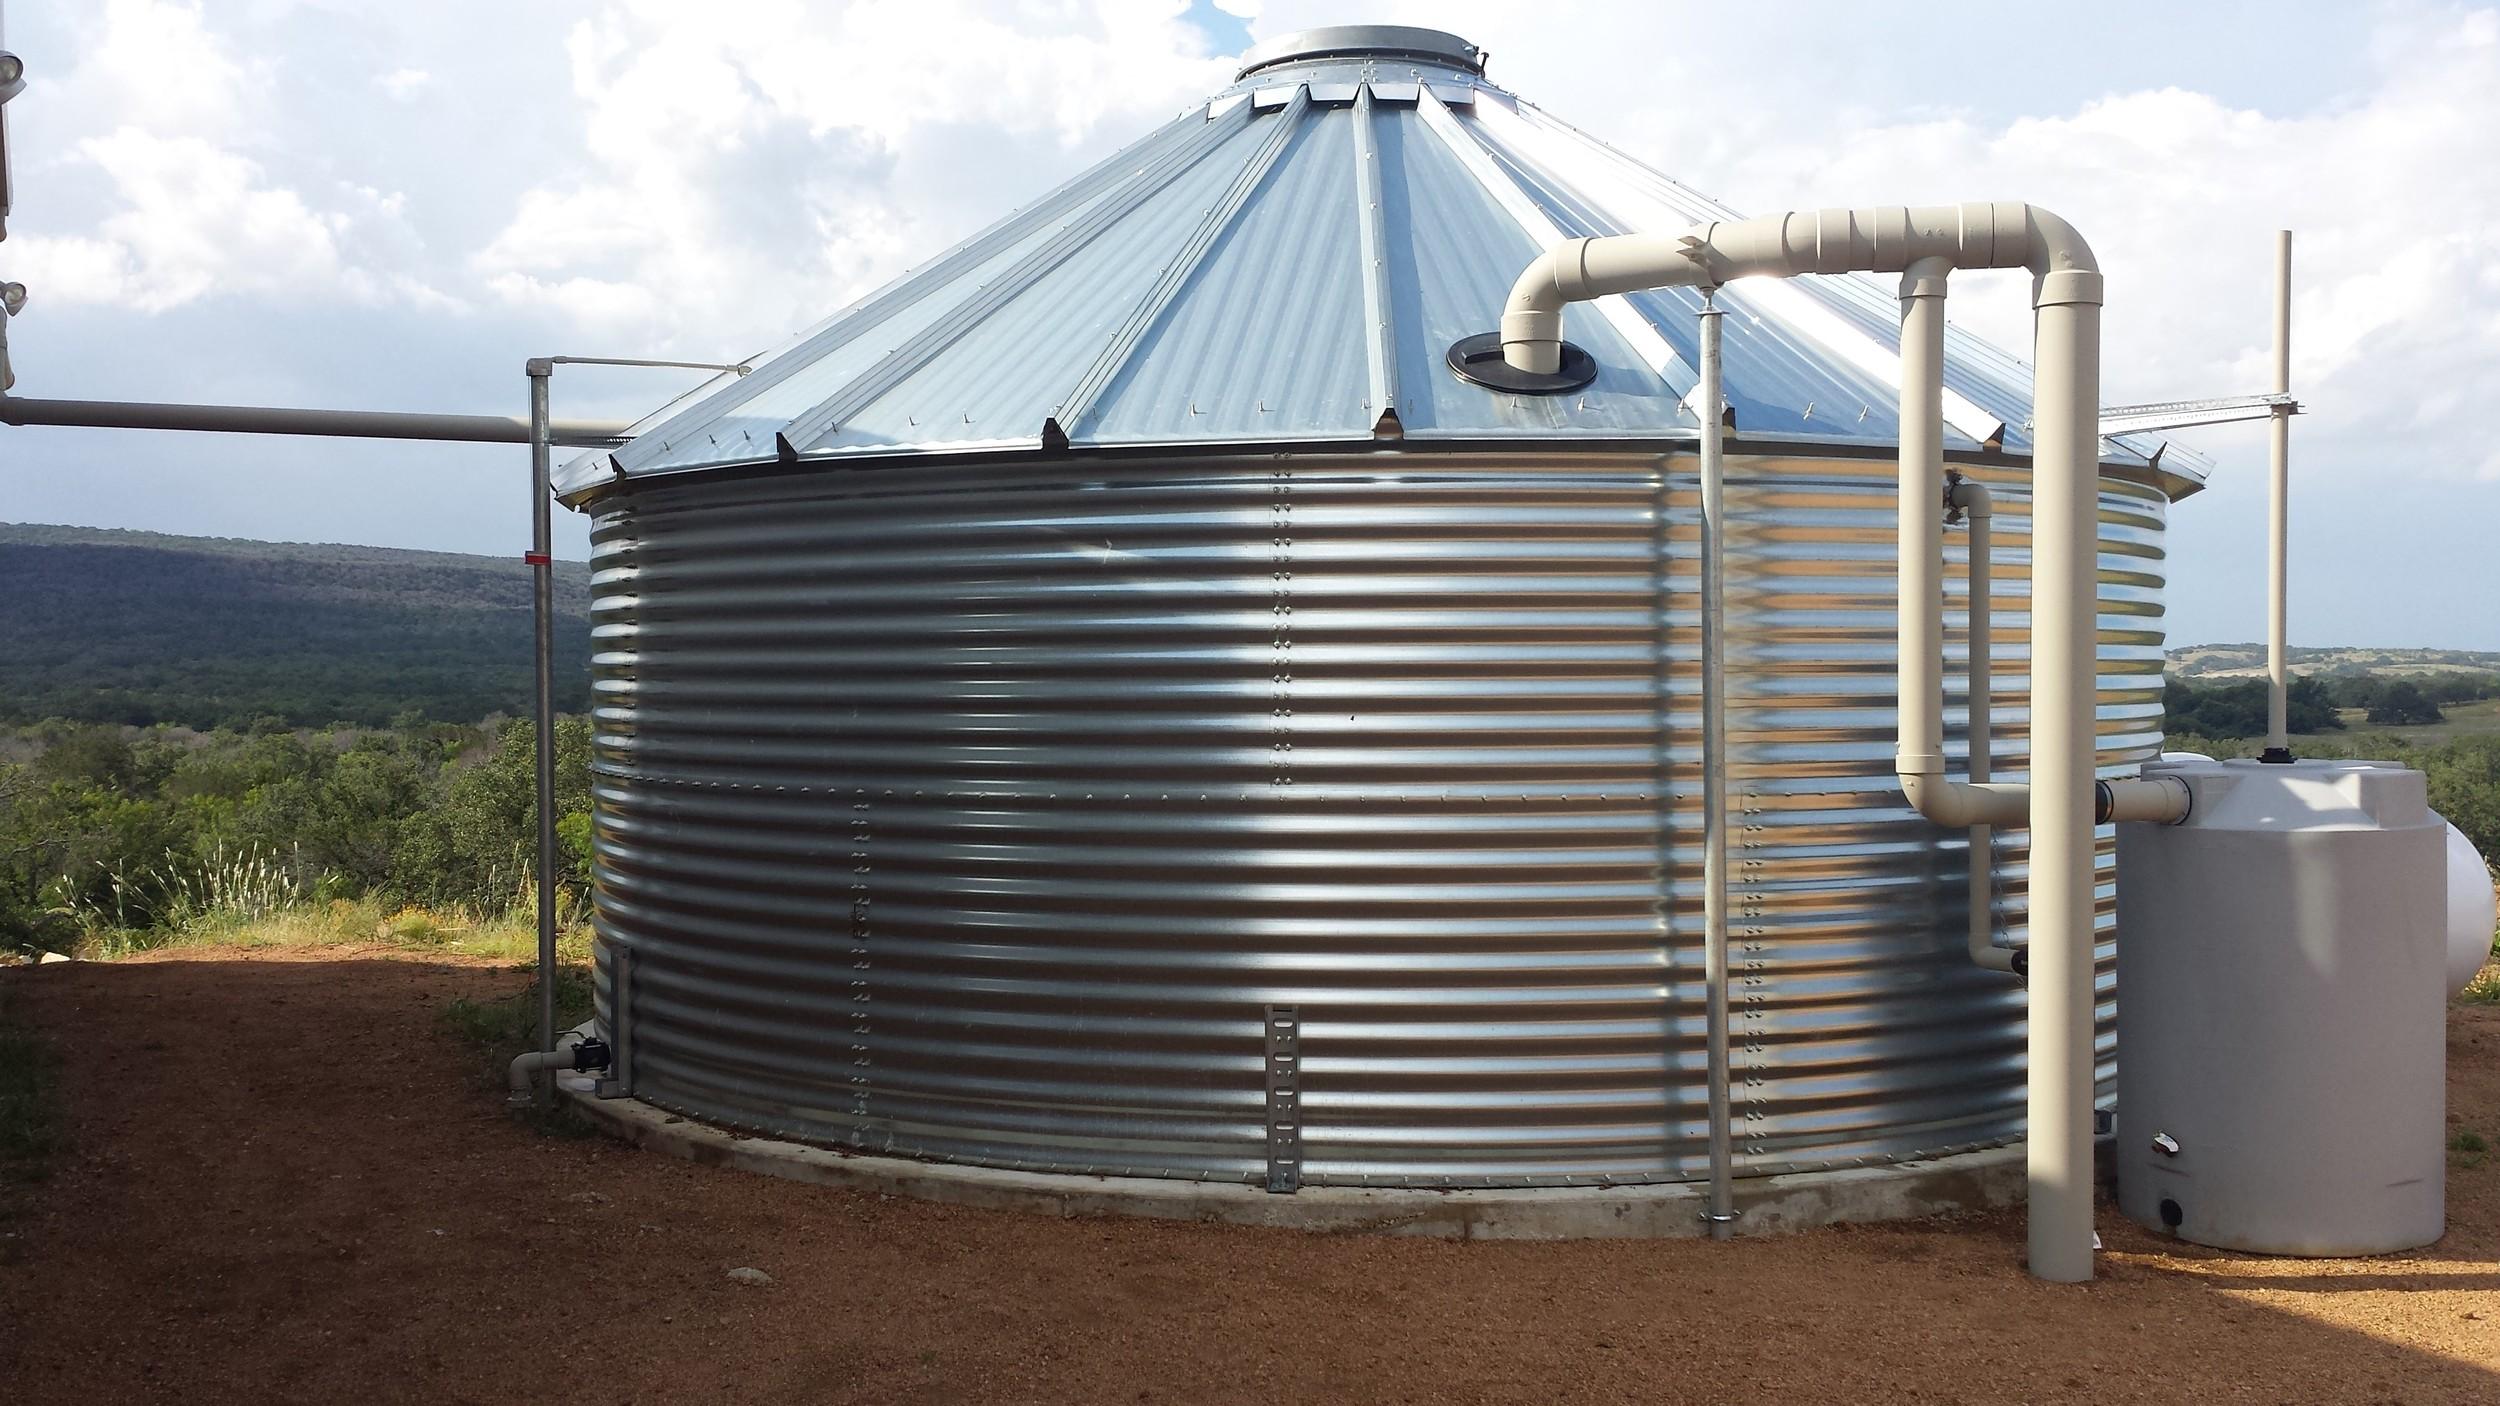 Residential rainwater collection system near Fredericksburg, Texas